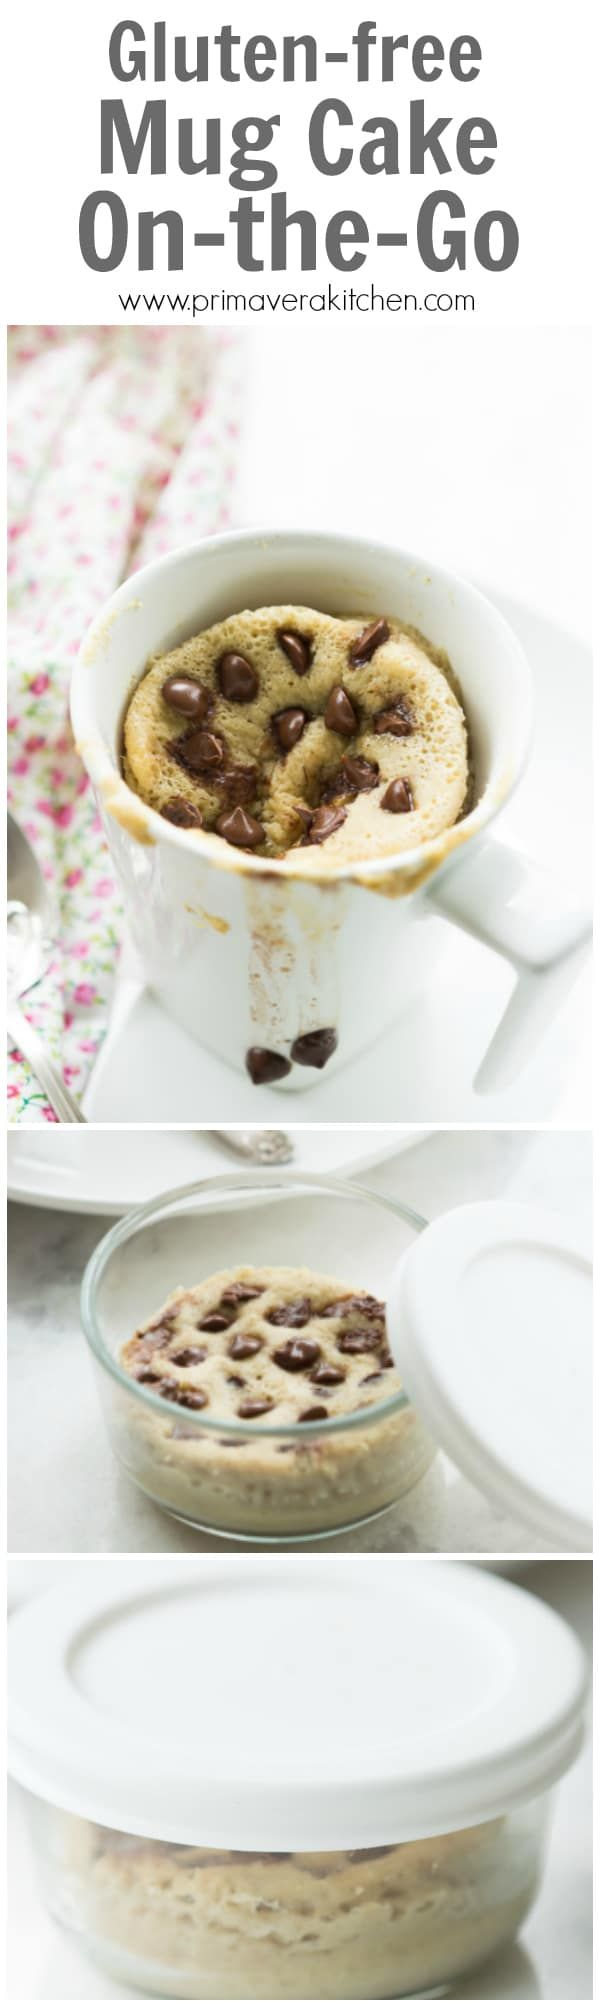 Gluten-free Mug Cake On-the-Go - I called this recipe ...